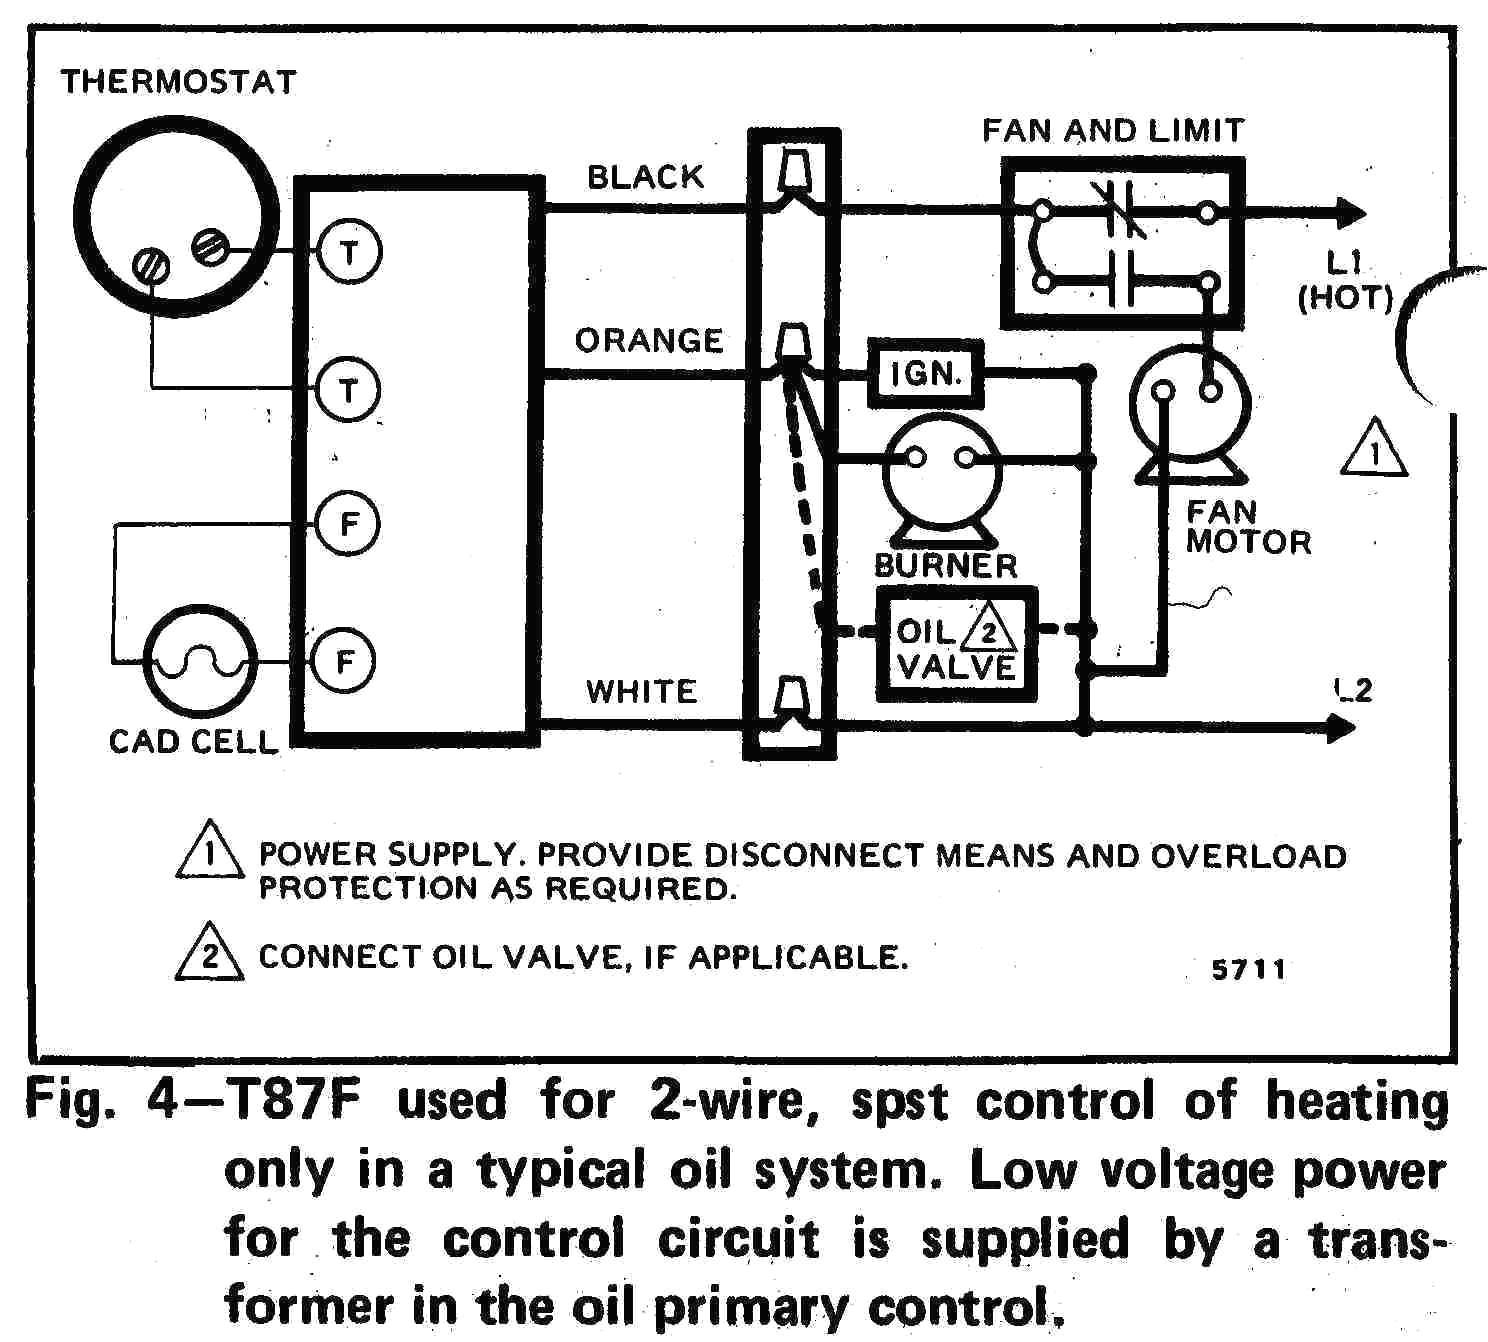 Hvac Low Voltage Wiring Diagram Hrk Heating Hvac Wiring Diagrams Wiring Diagram Centre